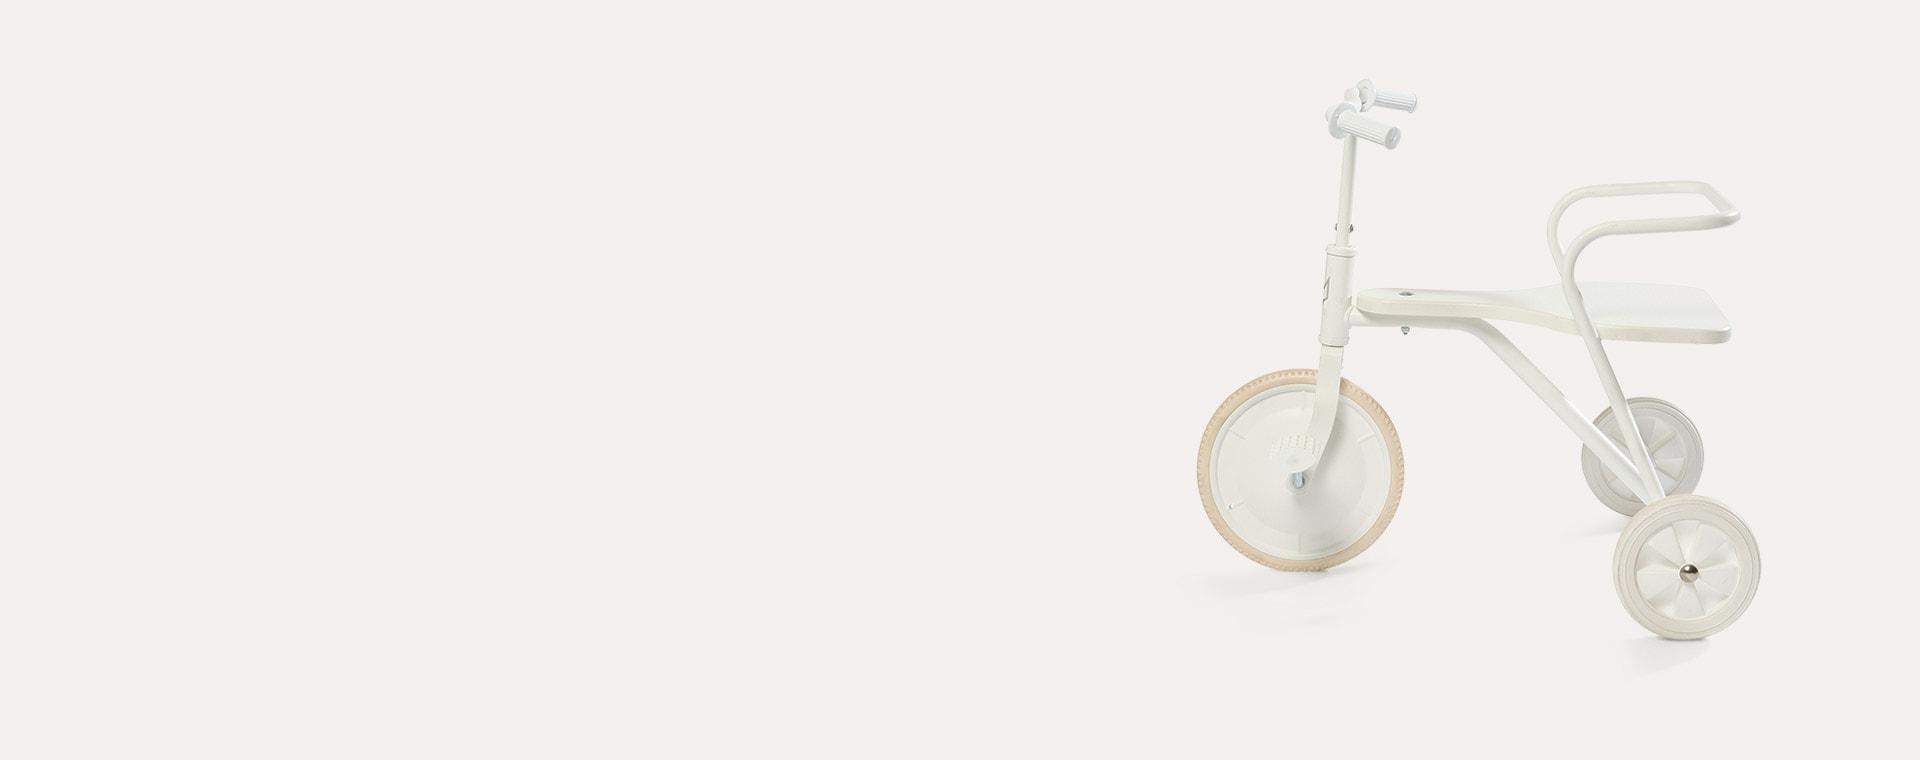 White Foxrider Retro Tricycle